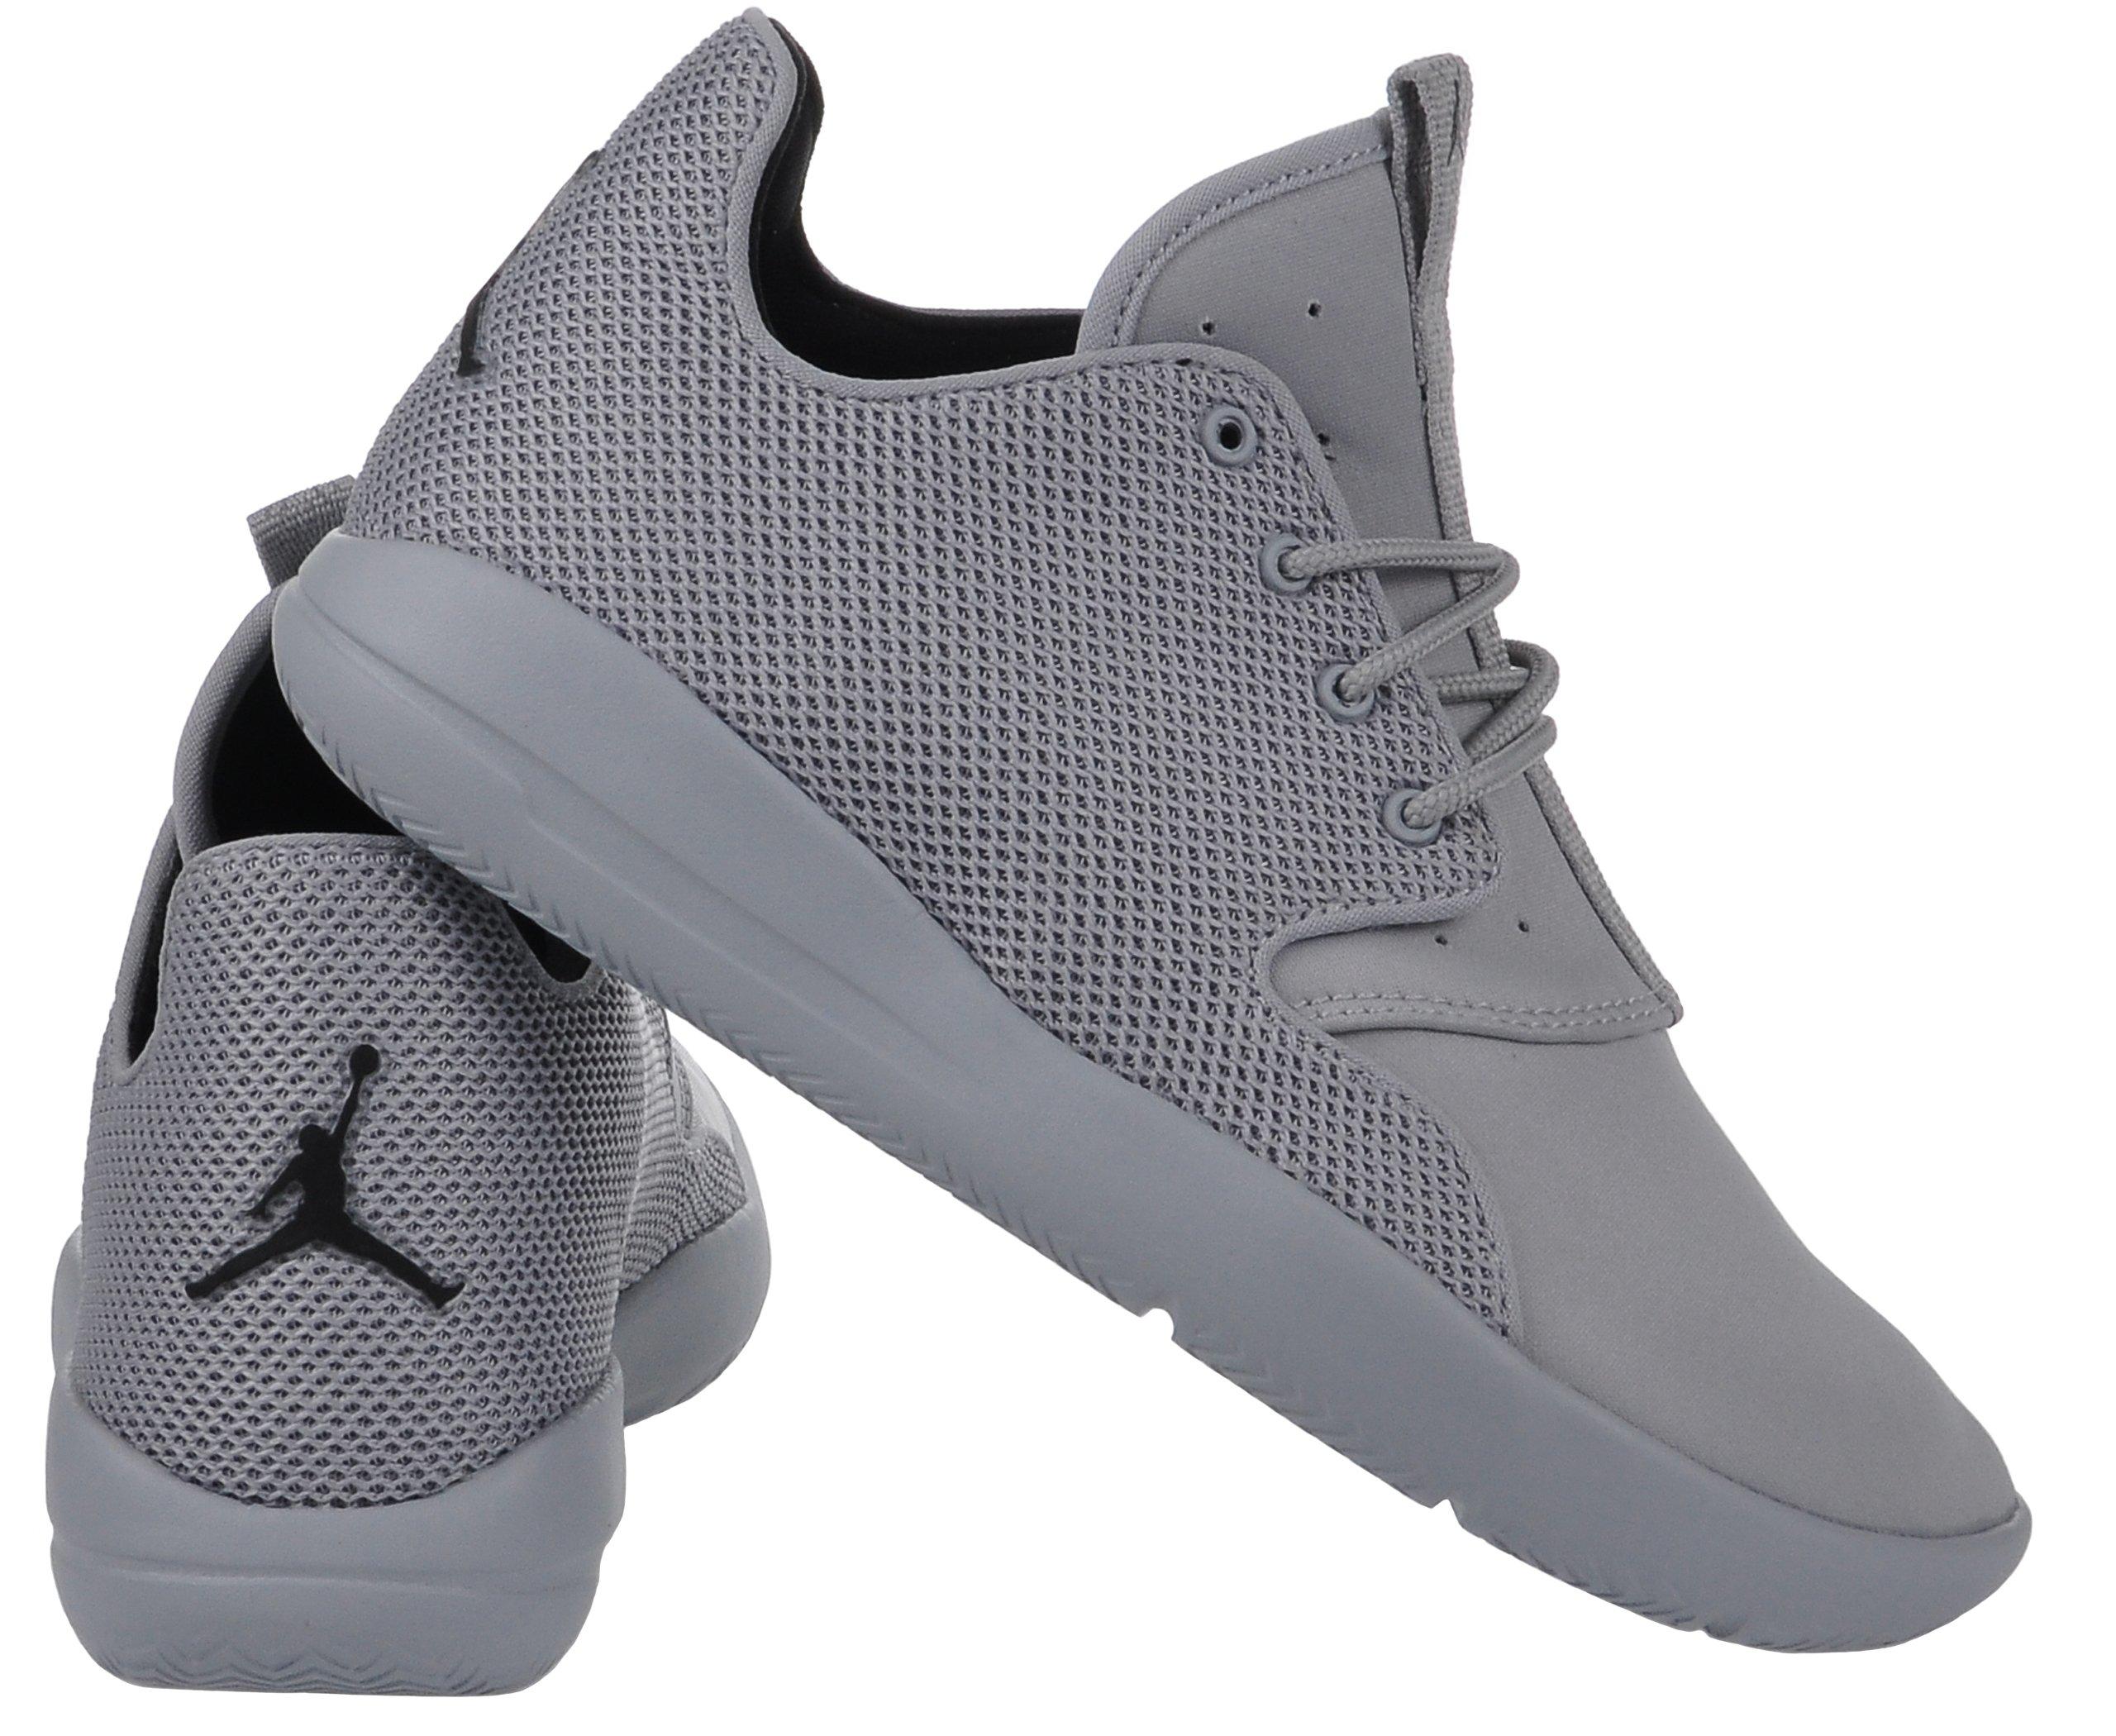 sports shoes e52ee 43934 ... new style buty damskie nike jordan eclipse 724042 004 r.36 c2ece 1062d